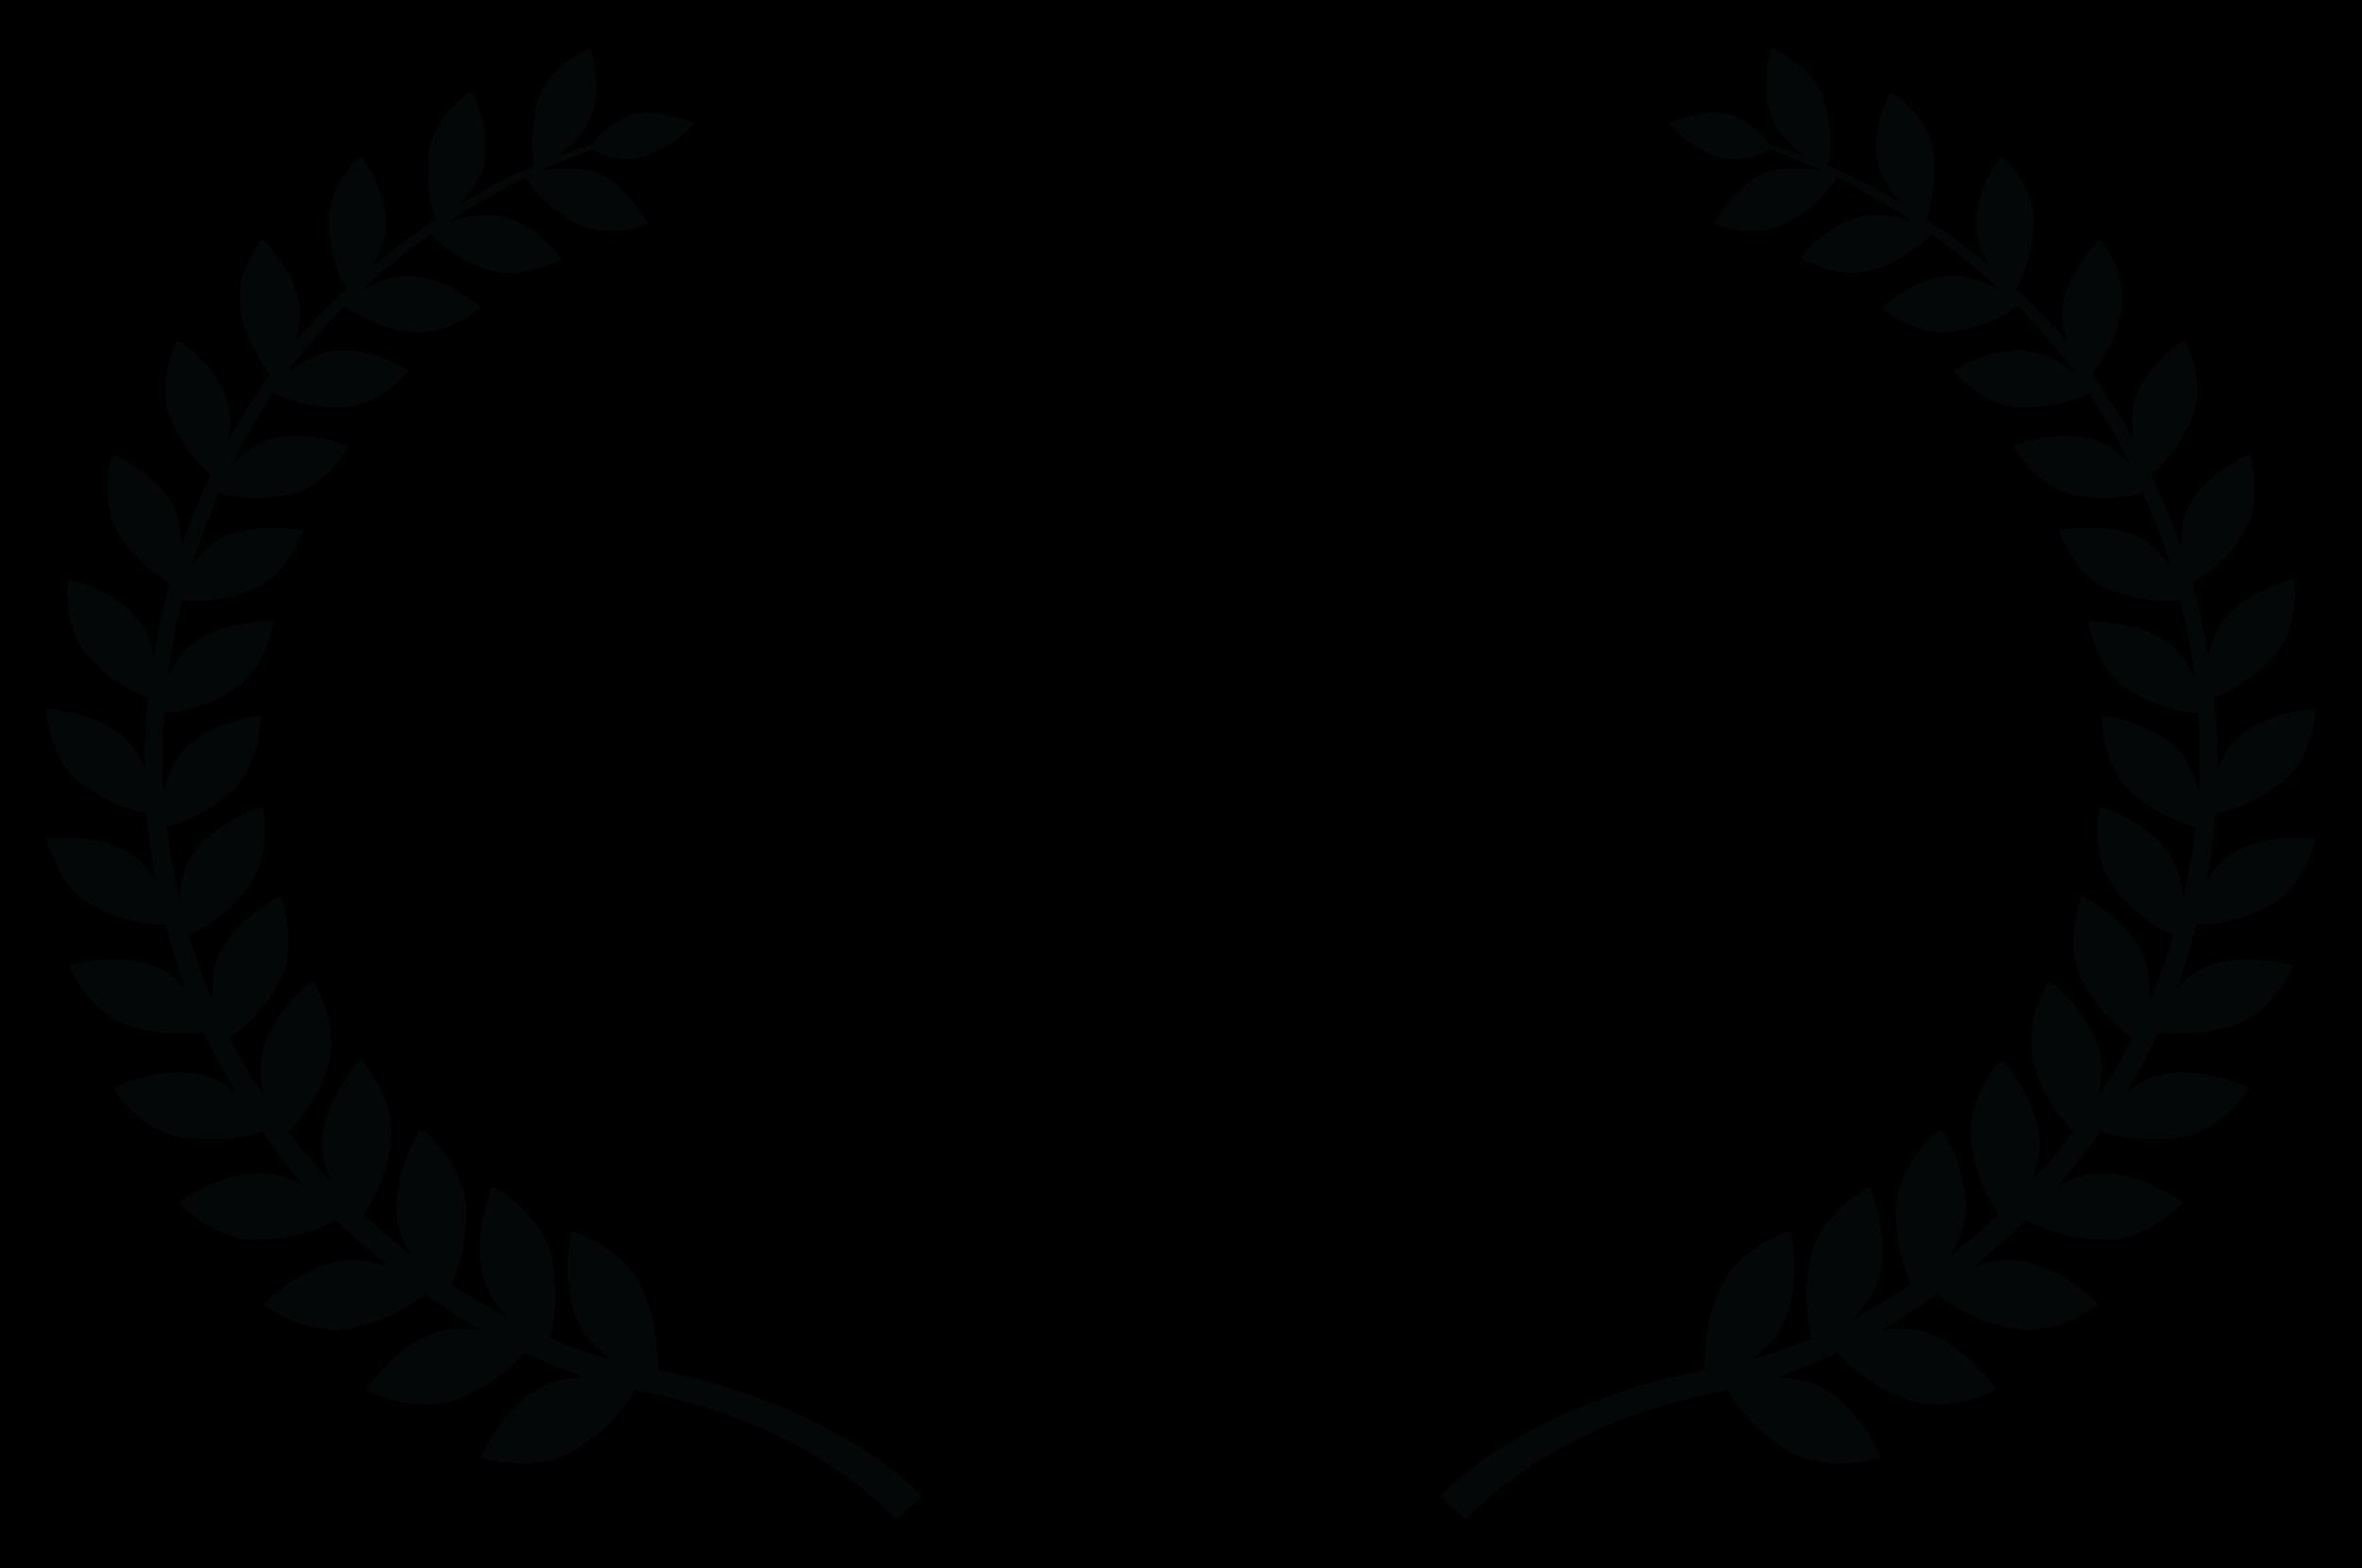 OFFICIALSELECTION-HuntingtonBeachFilmFestival-2019.png